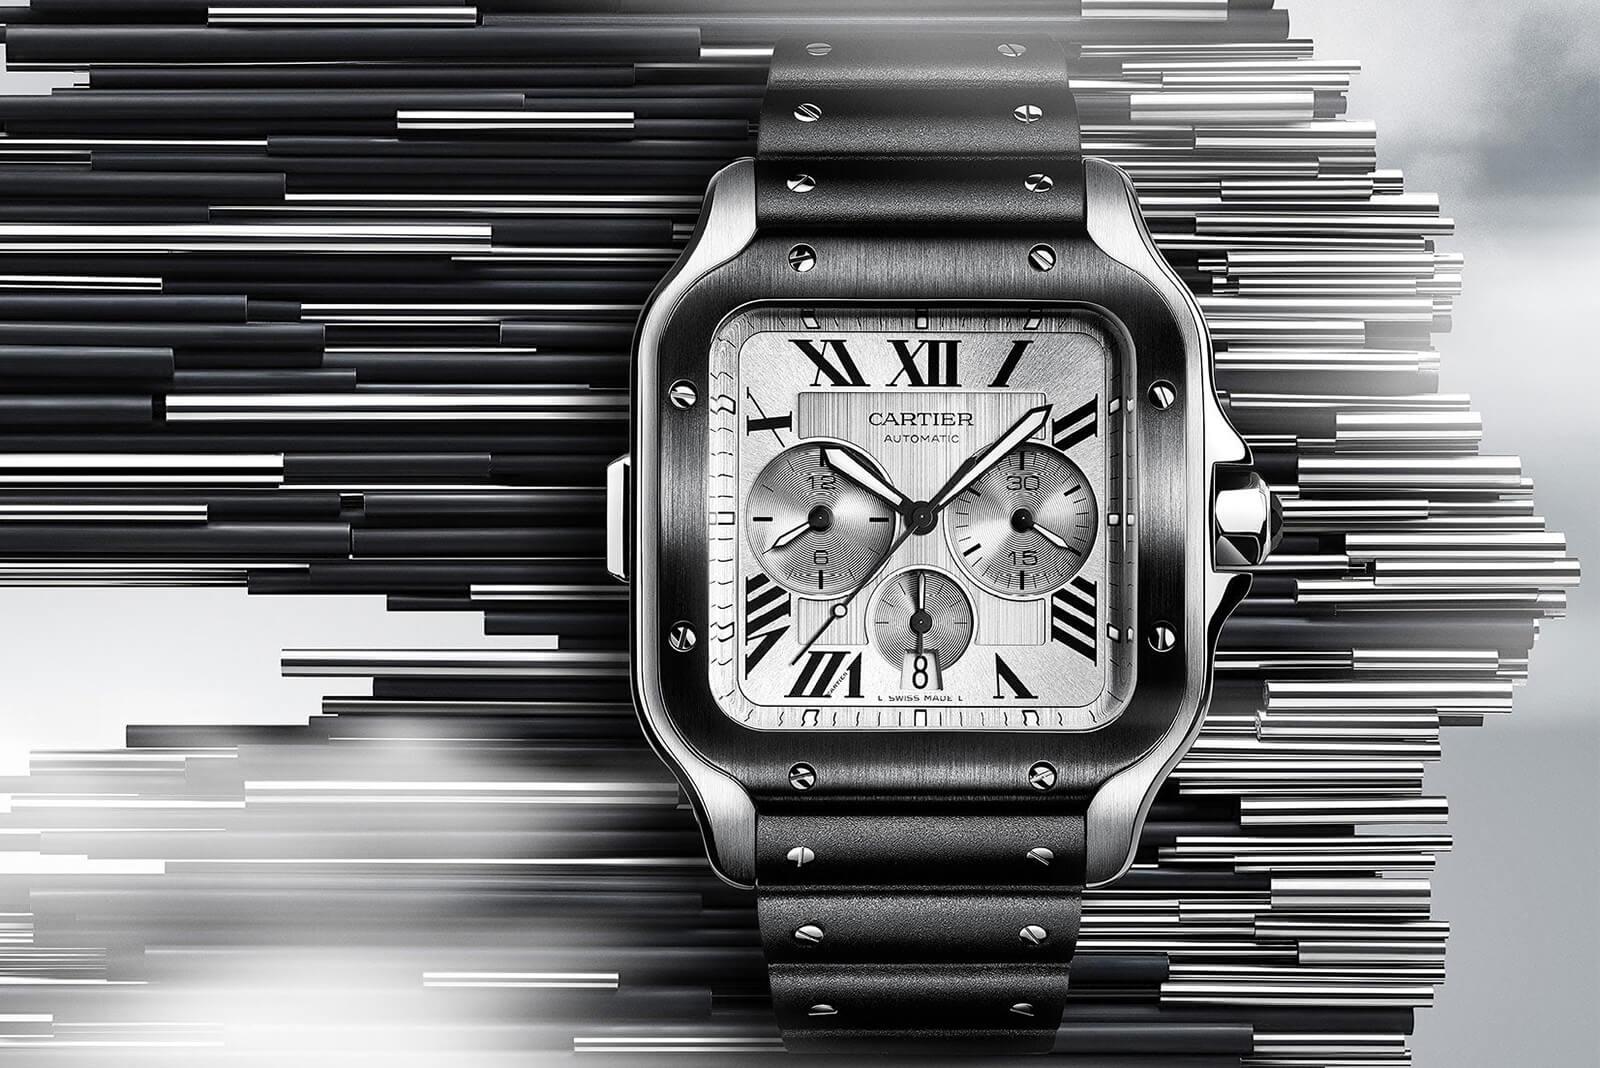 9449e6e97 Introducing the Santos de Cartier Chronograph and Squelette ...